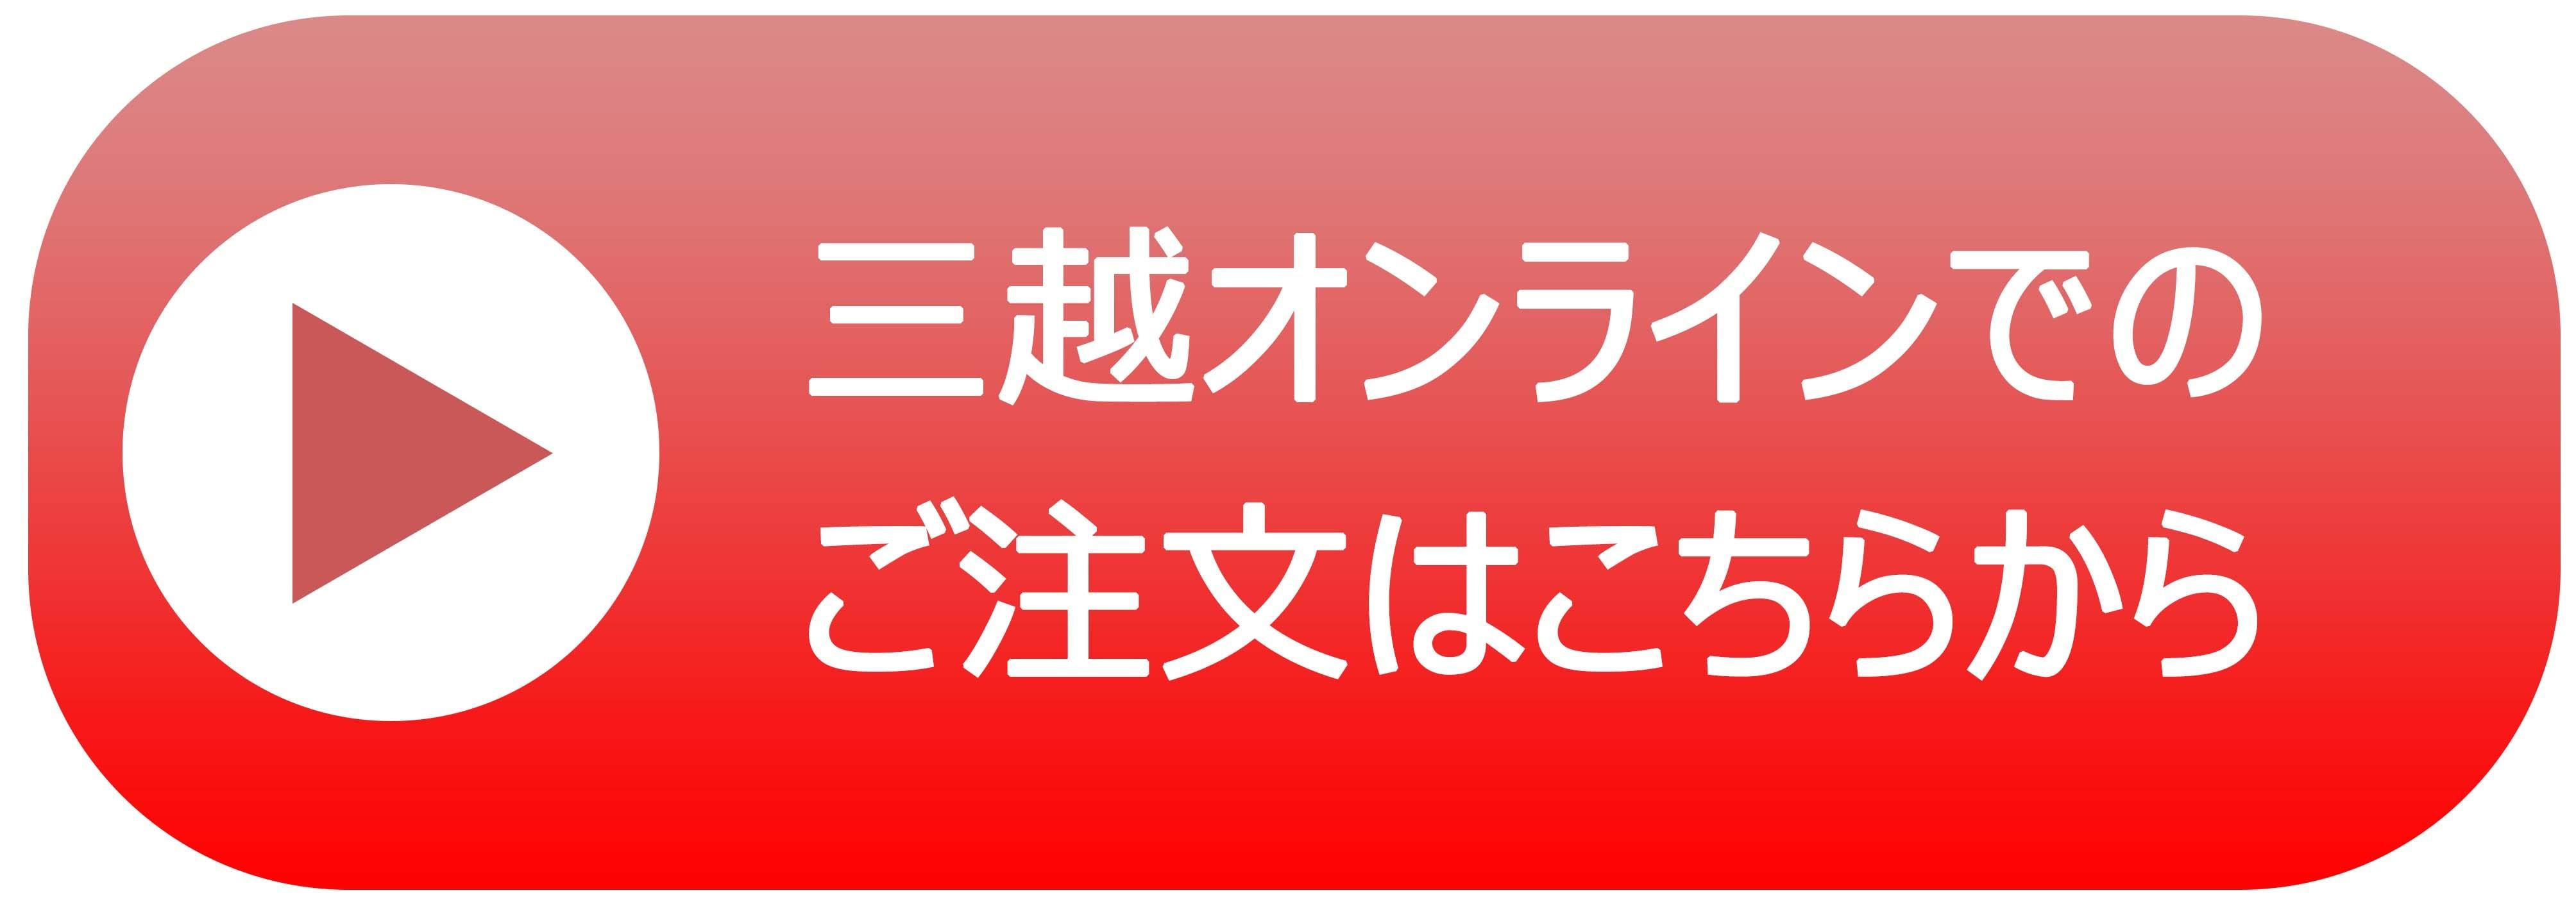 https://gigaplus.makeshop.jp/jinsuke/2020summer/m_link.jpg